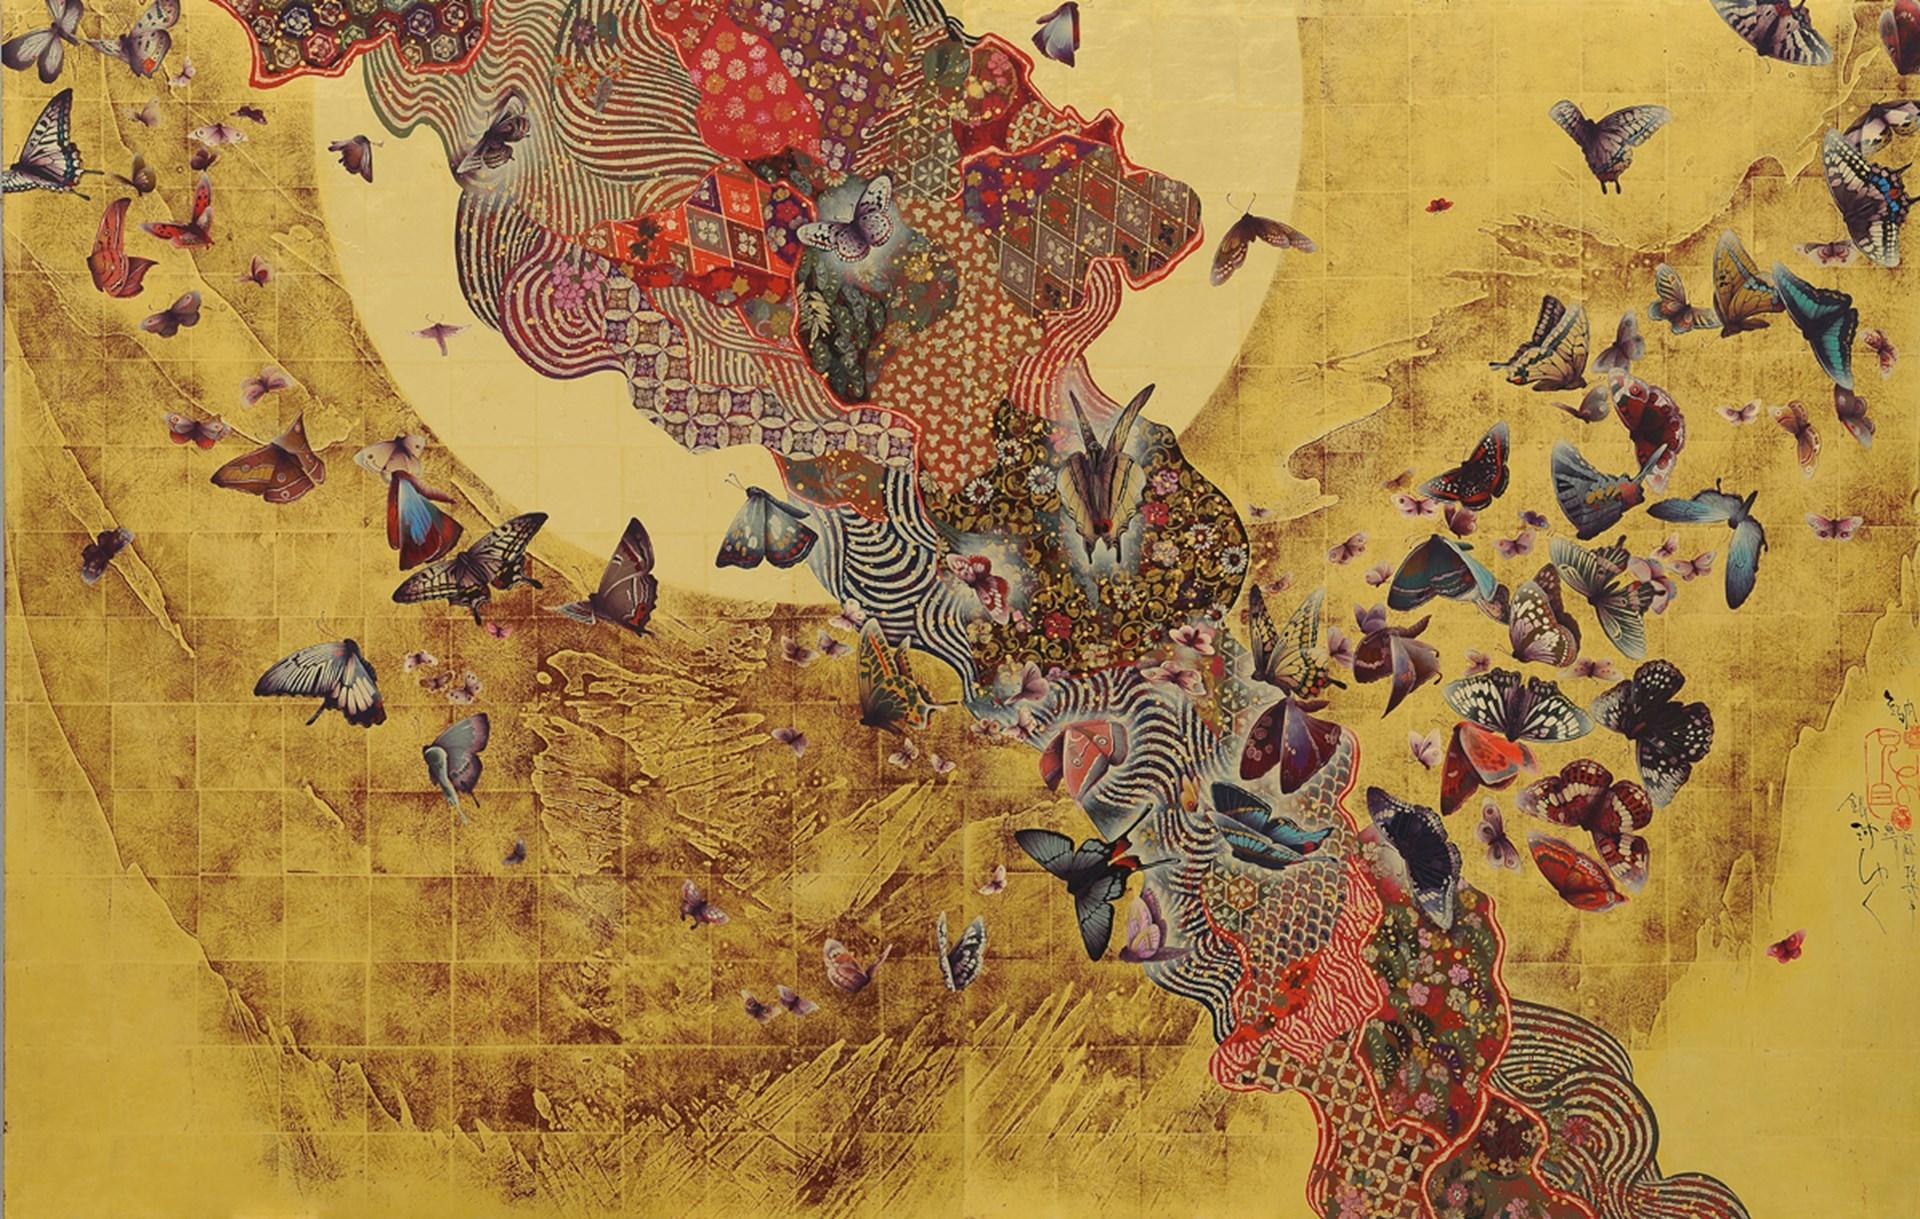 TOKYO. Japanese artist Kyosuke Tchinai. Tamenaga Gallery